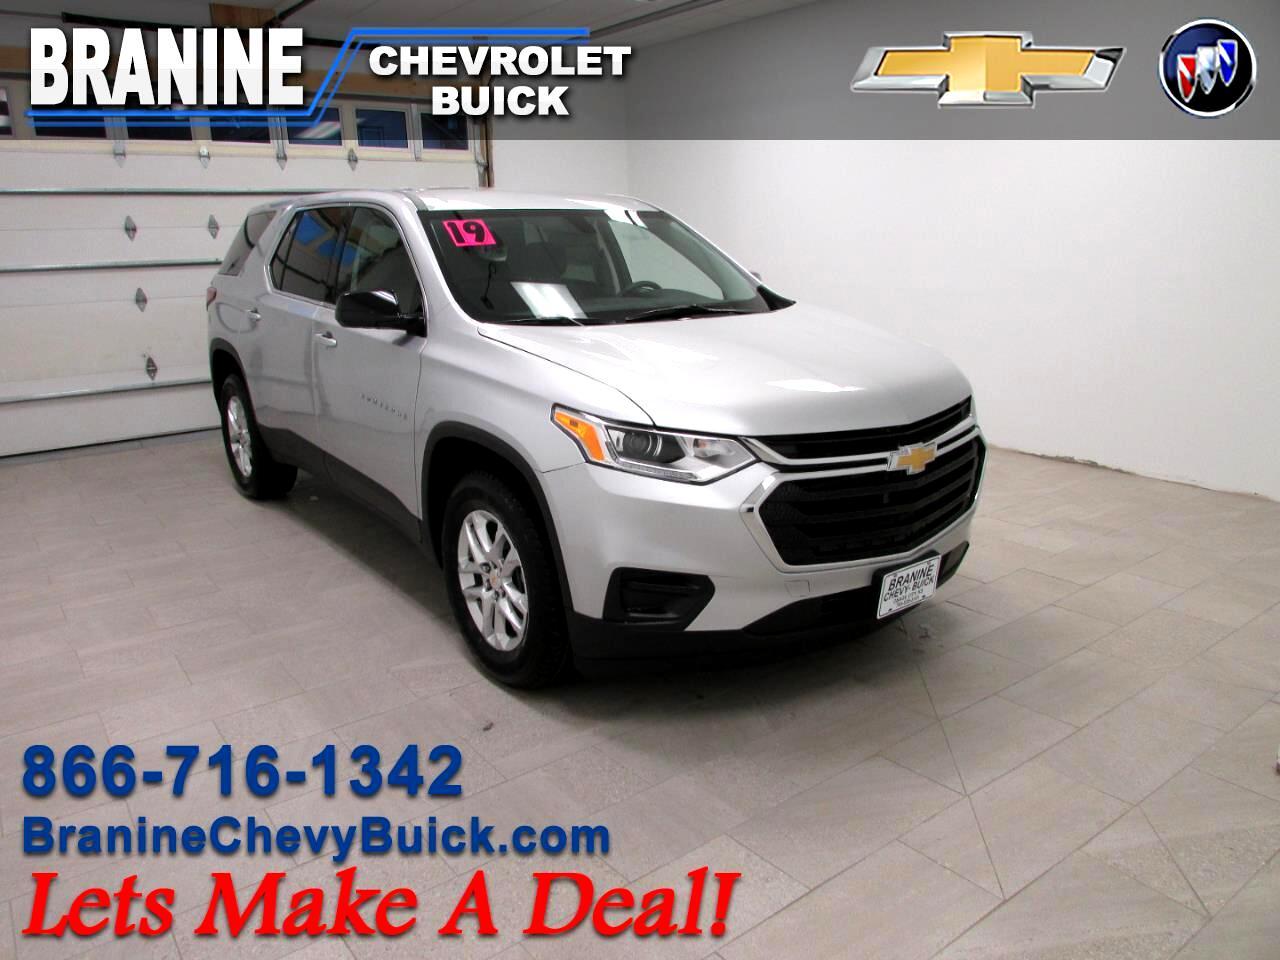 2019 Chevrolet Traverse FWD 4dr LS w/1LS